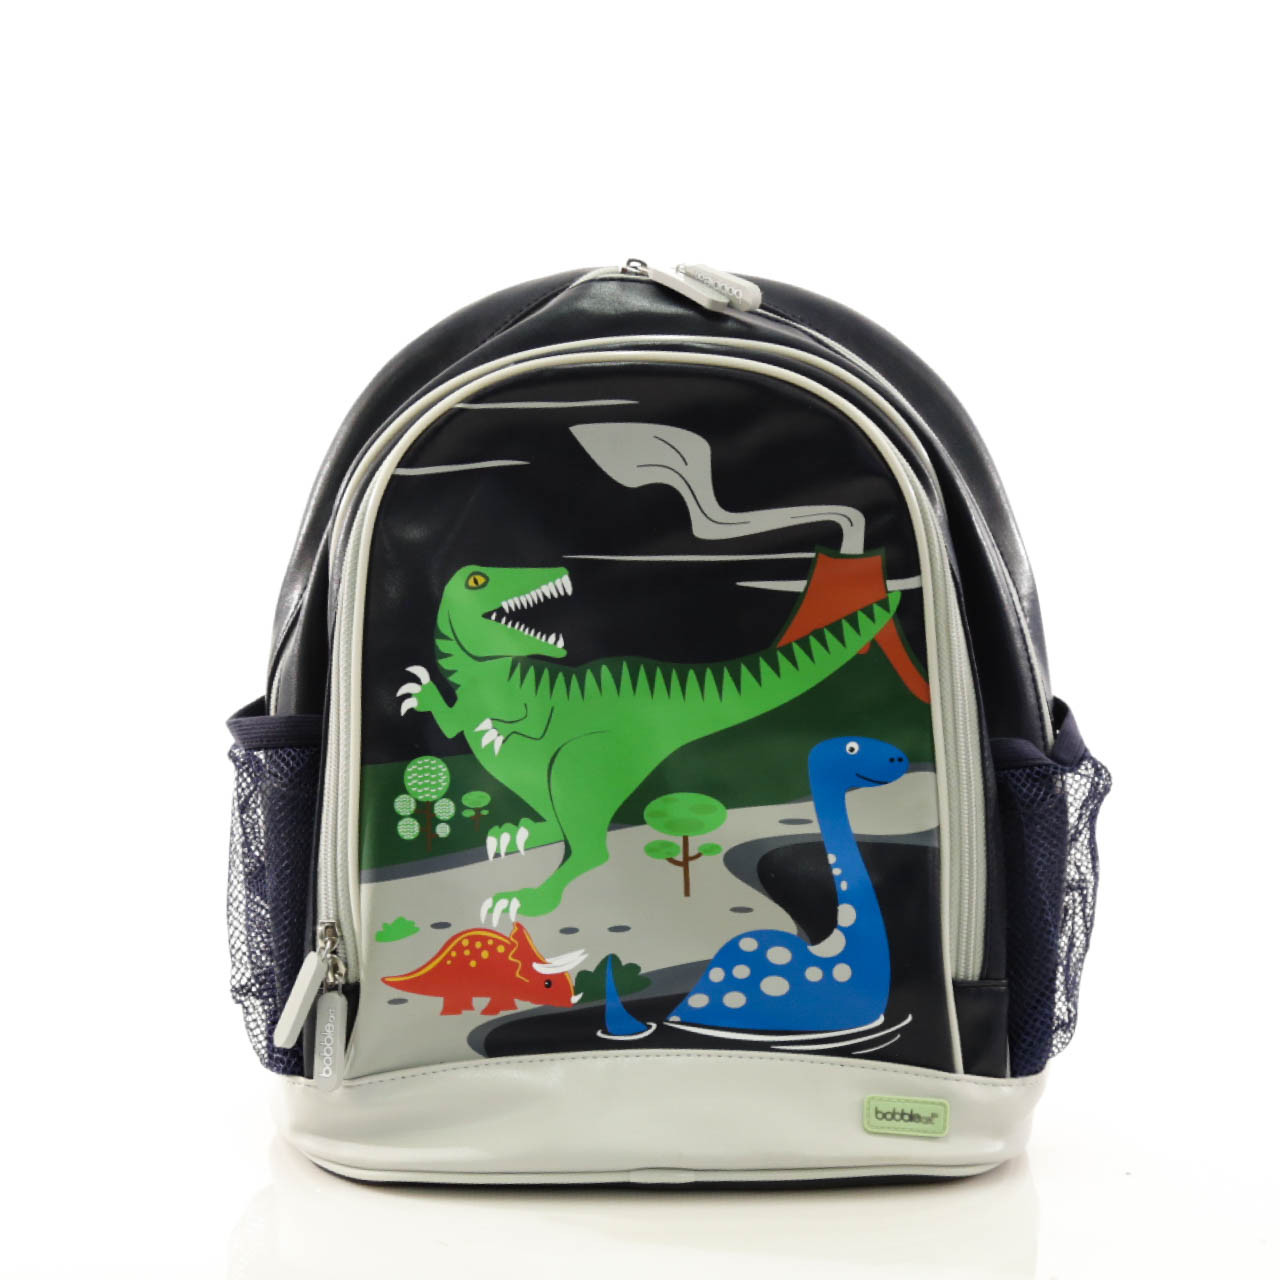 5ef84f08bc Large Backpack for Toddlers. Bobble Art Dinosaur Backpack. See more images